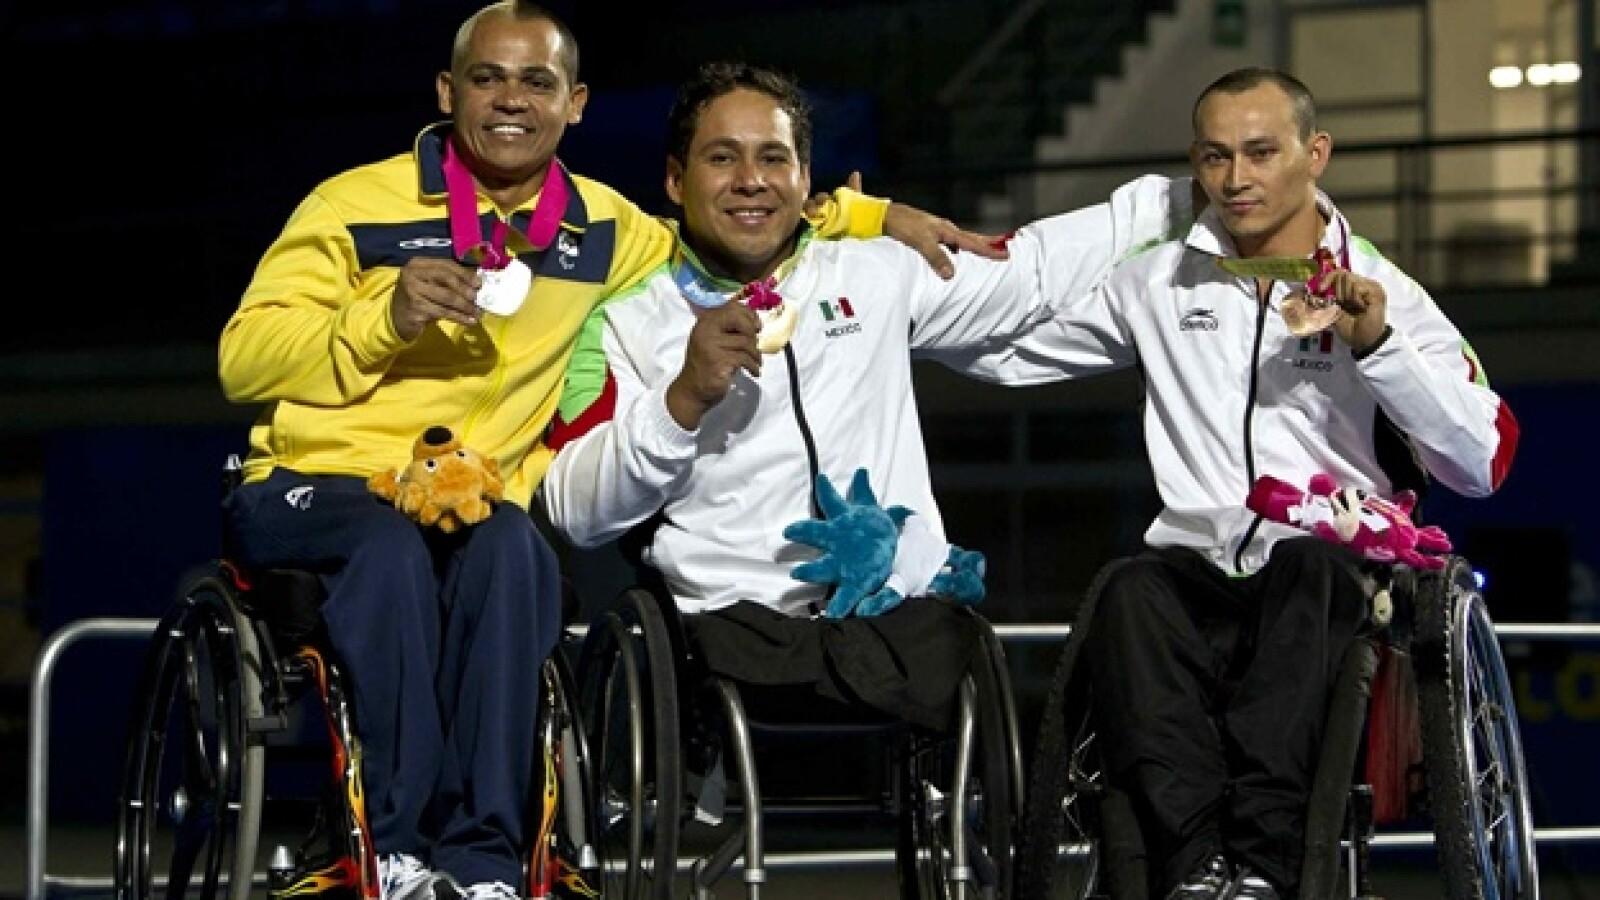 Pedro Rangel (Mexico) gold medal